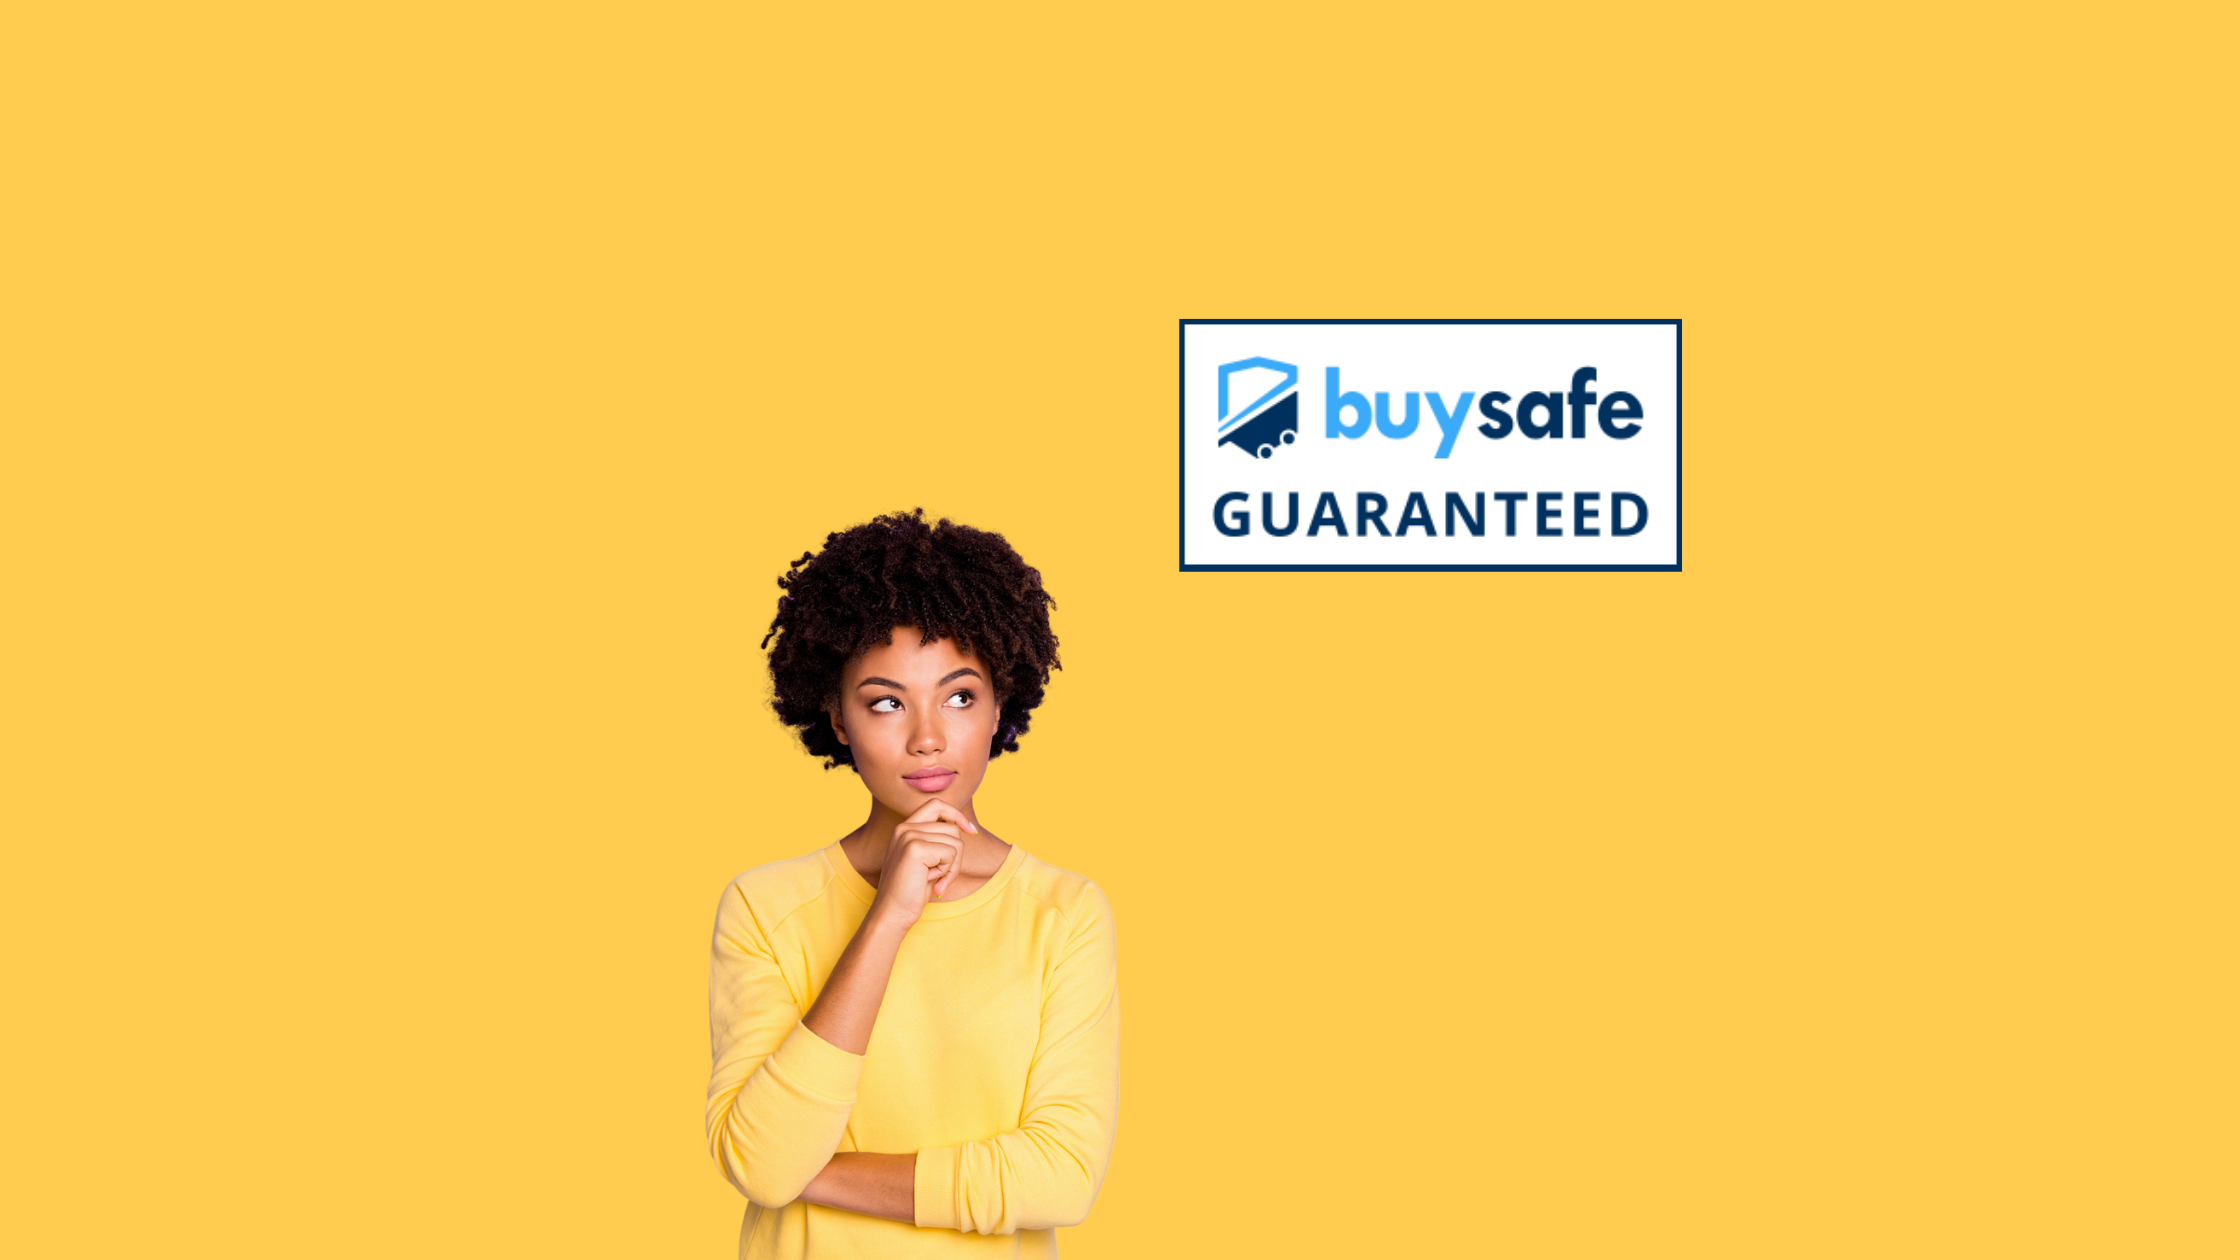 Is the BuySafe Shopping Guarantee Legitimate?